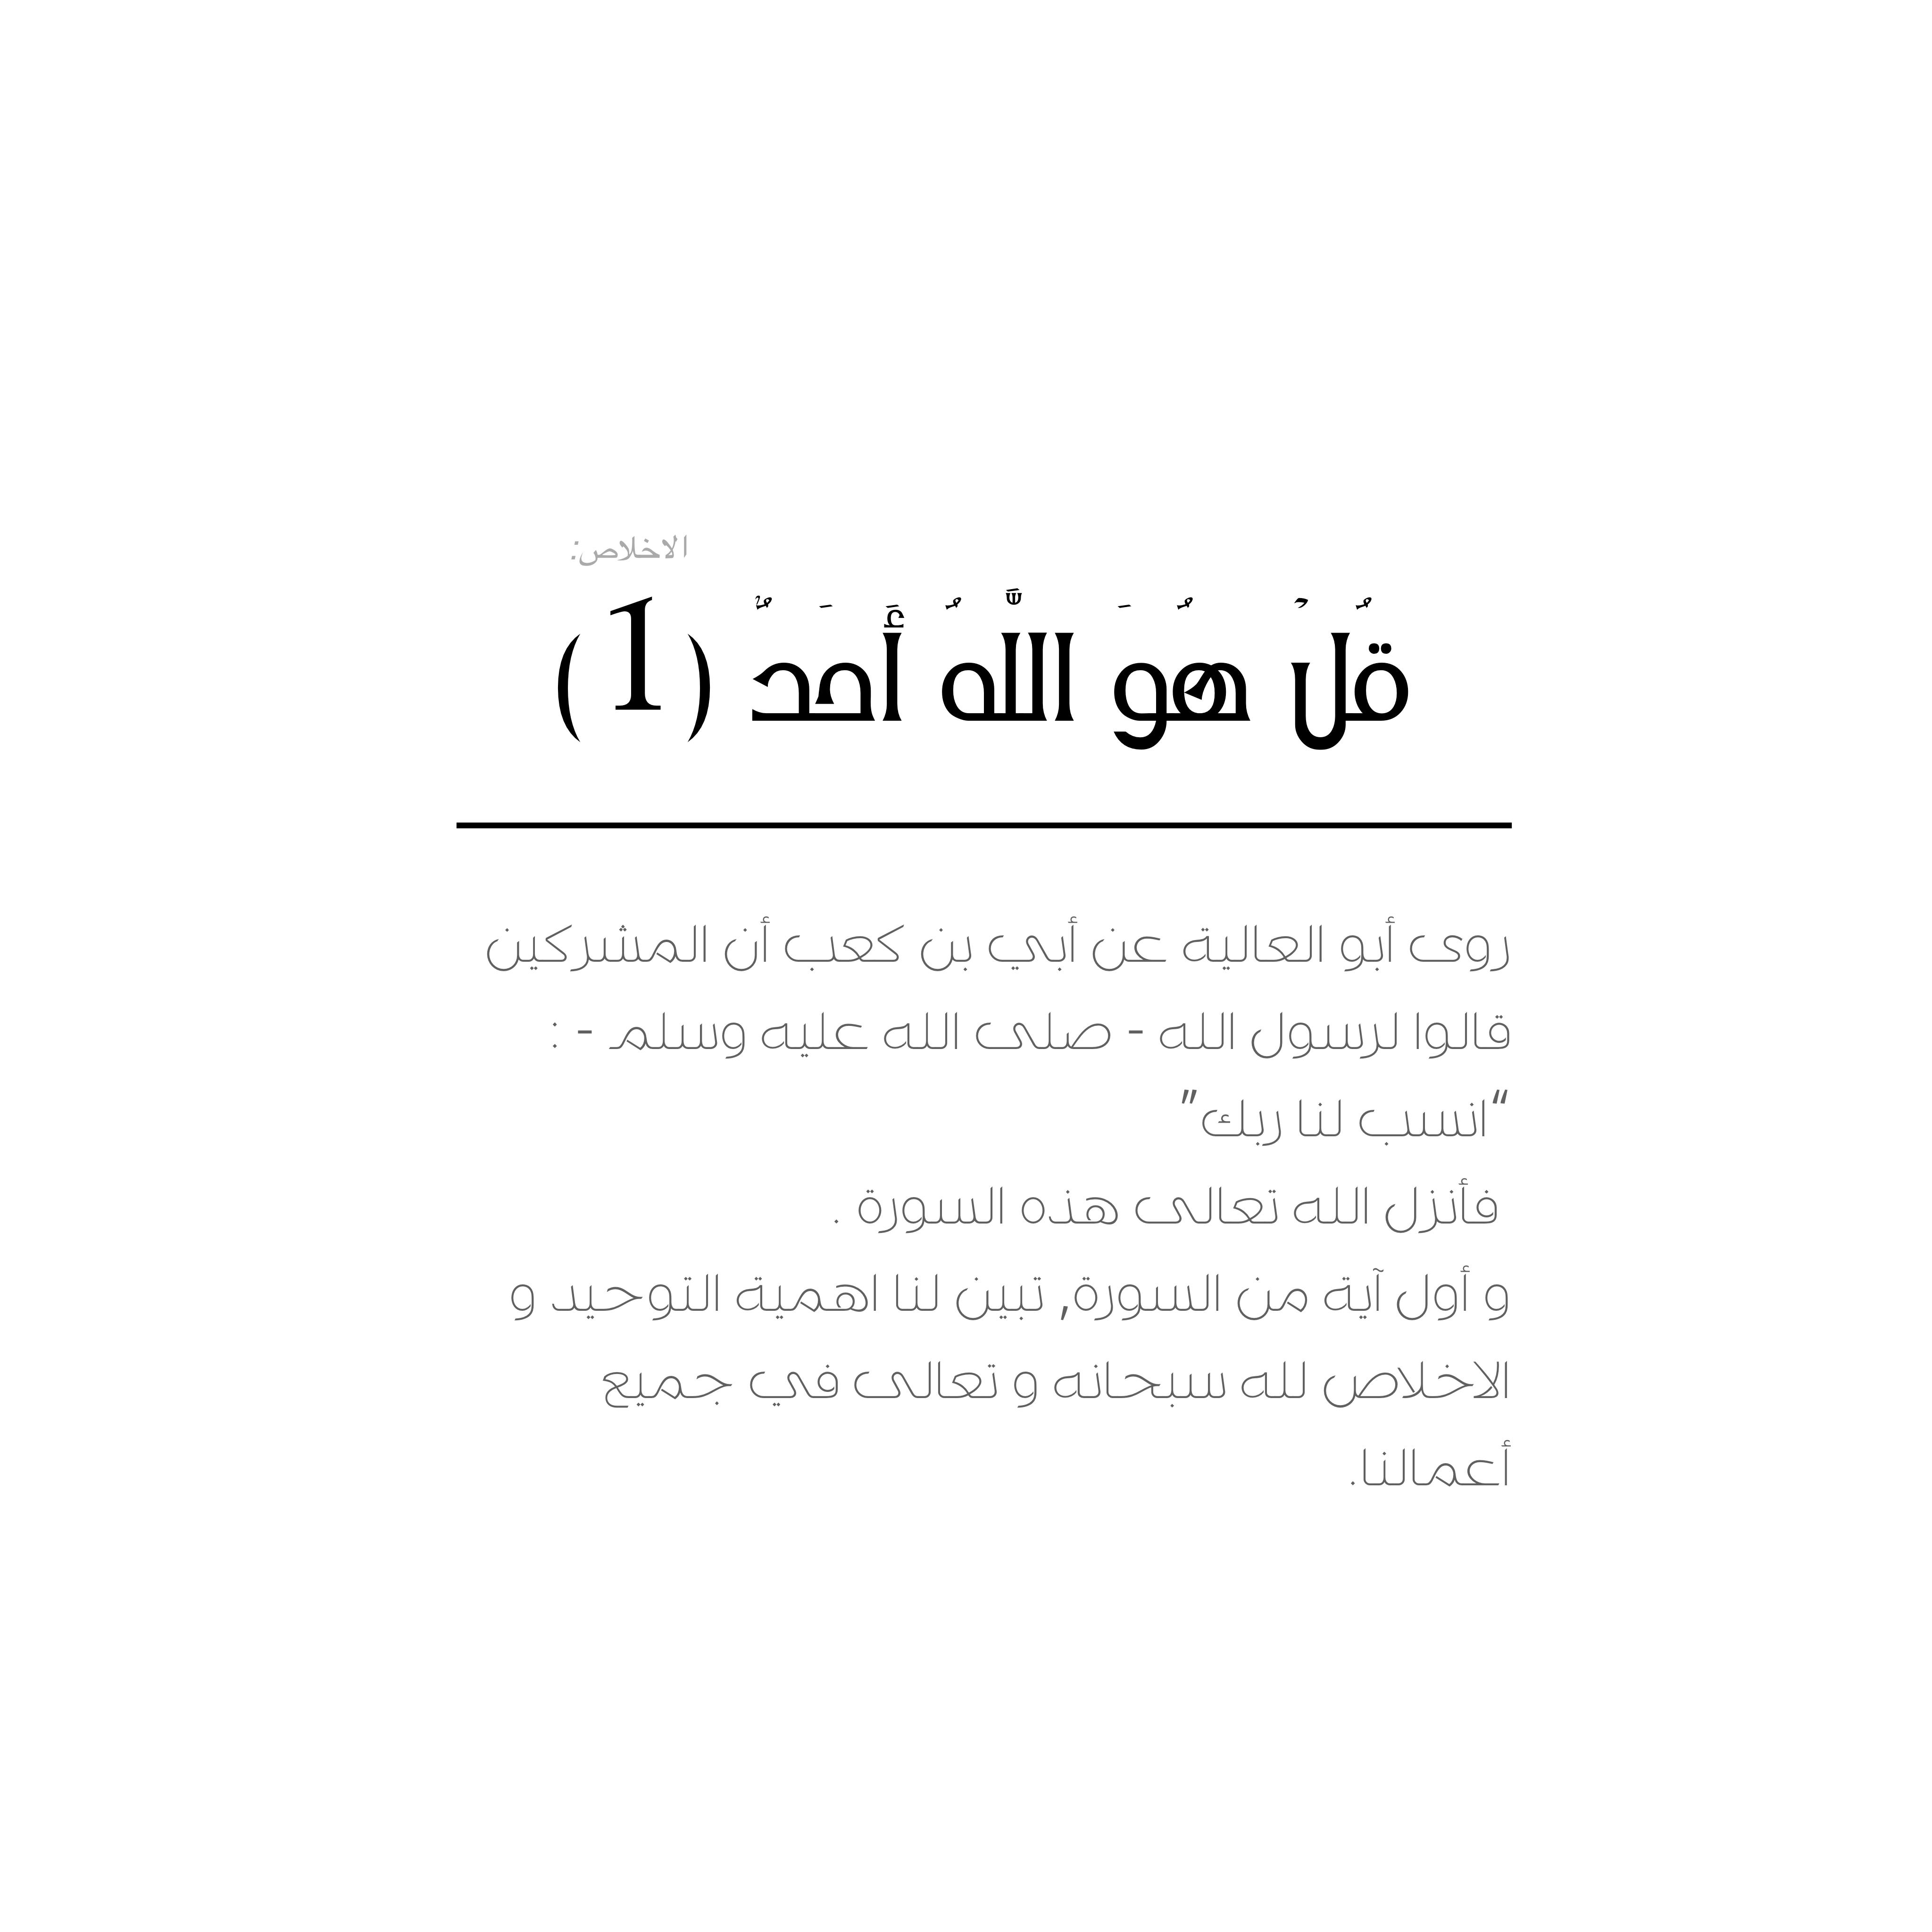 Quran Islam القران الاسلام سورة الاخلاص اية معاني كلمات Cards Against Humanity Math Oio